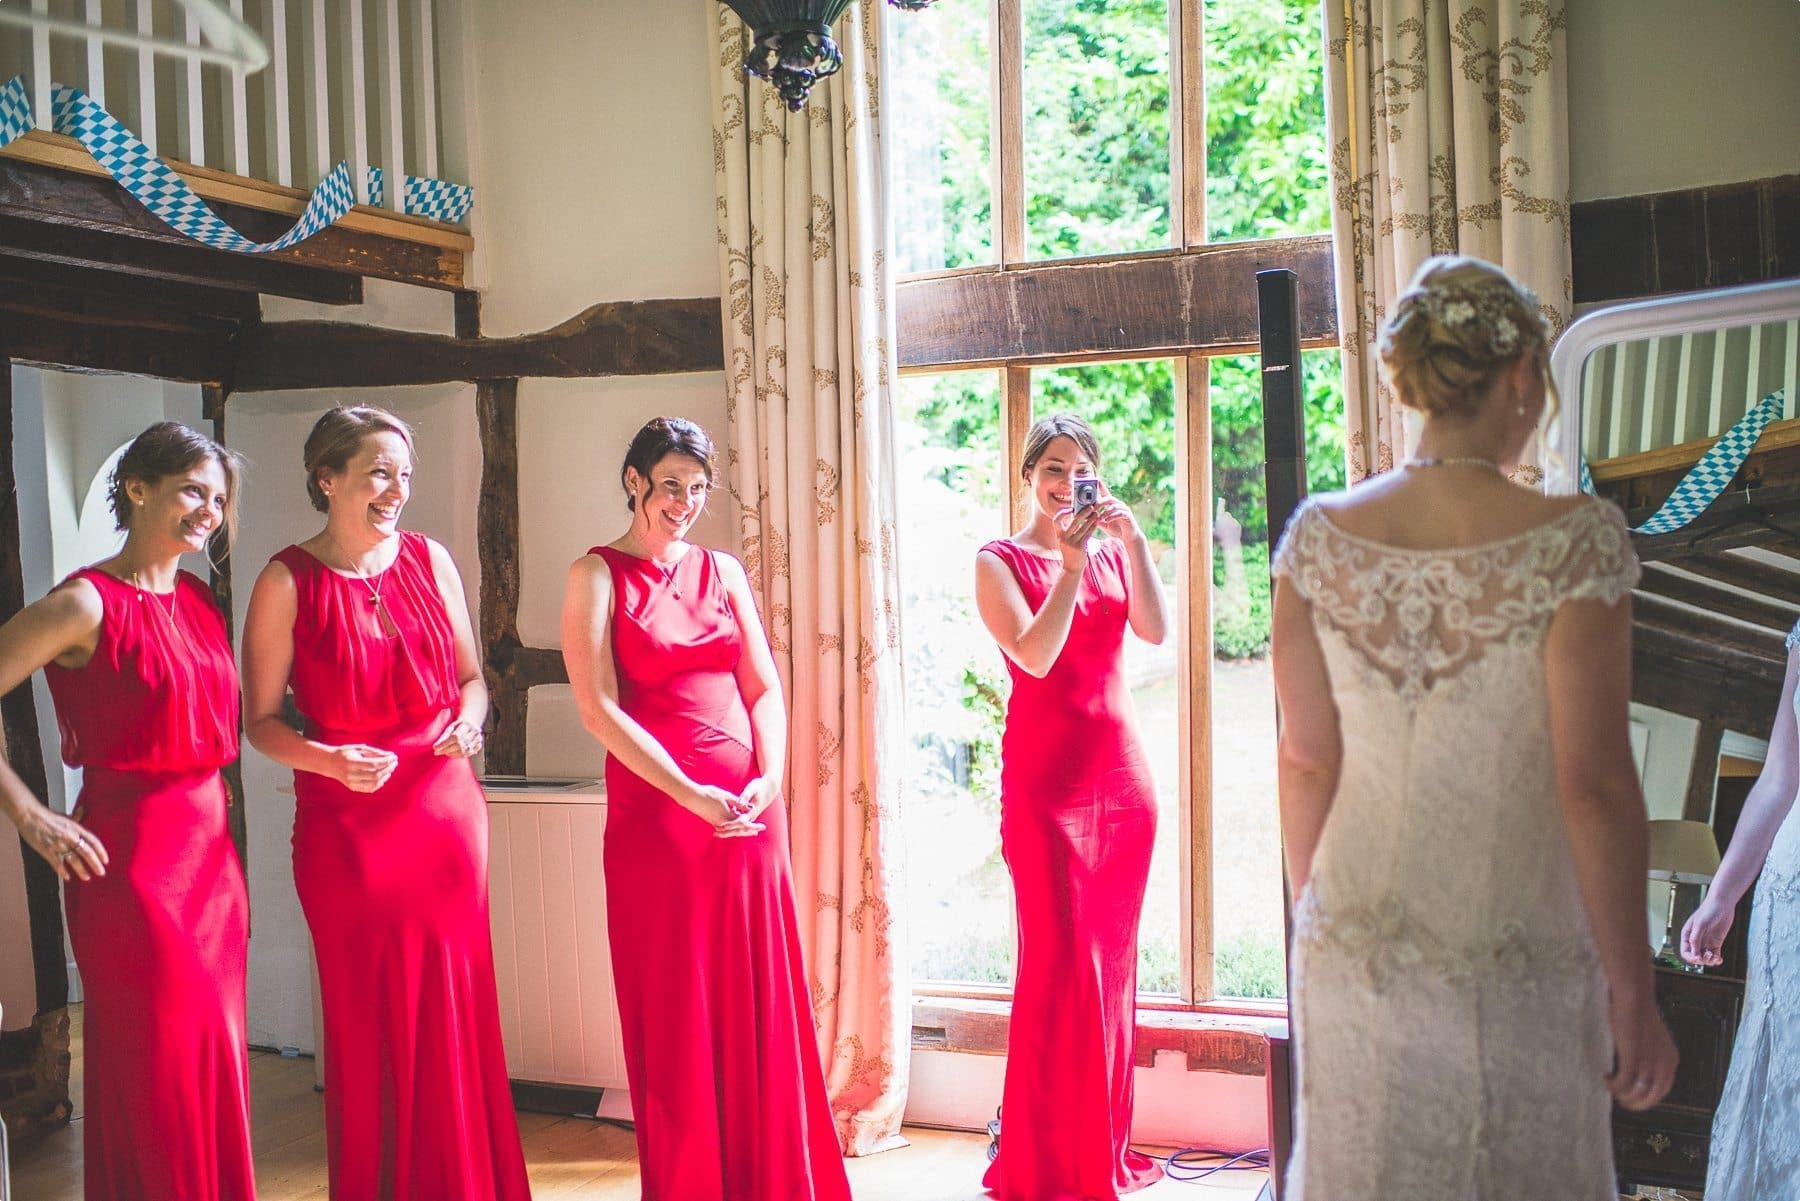 Bridesmaids looking and smiling at the beautiful bride at Coworth Park barn Dower House